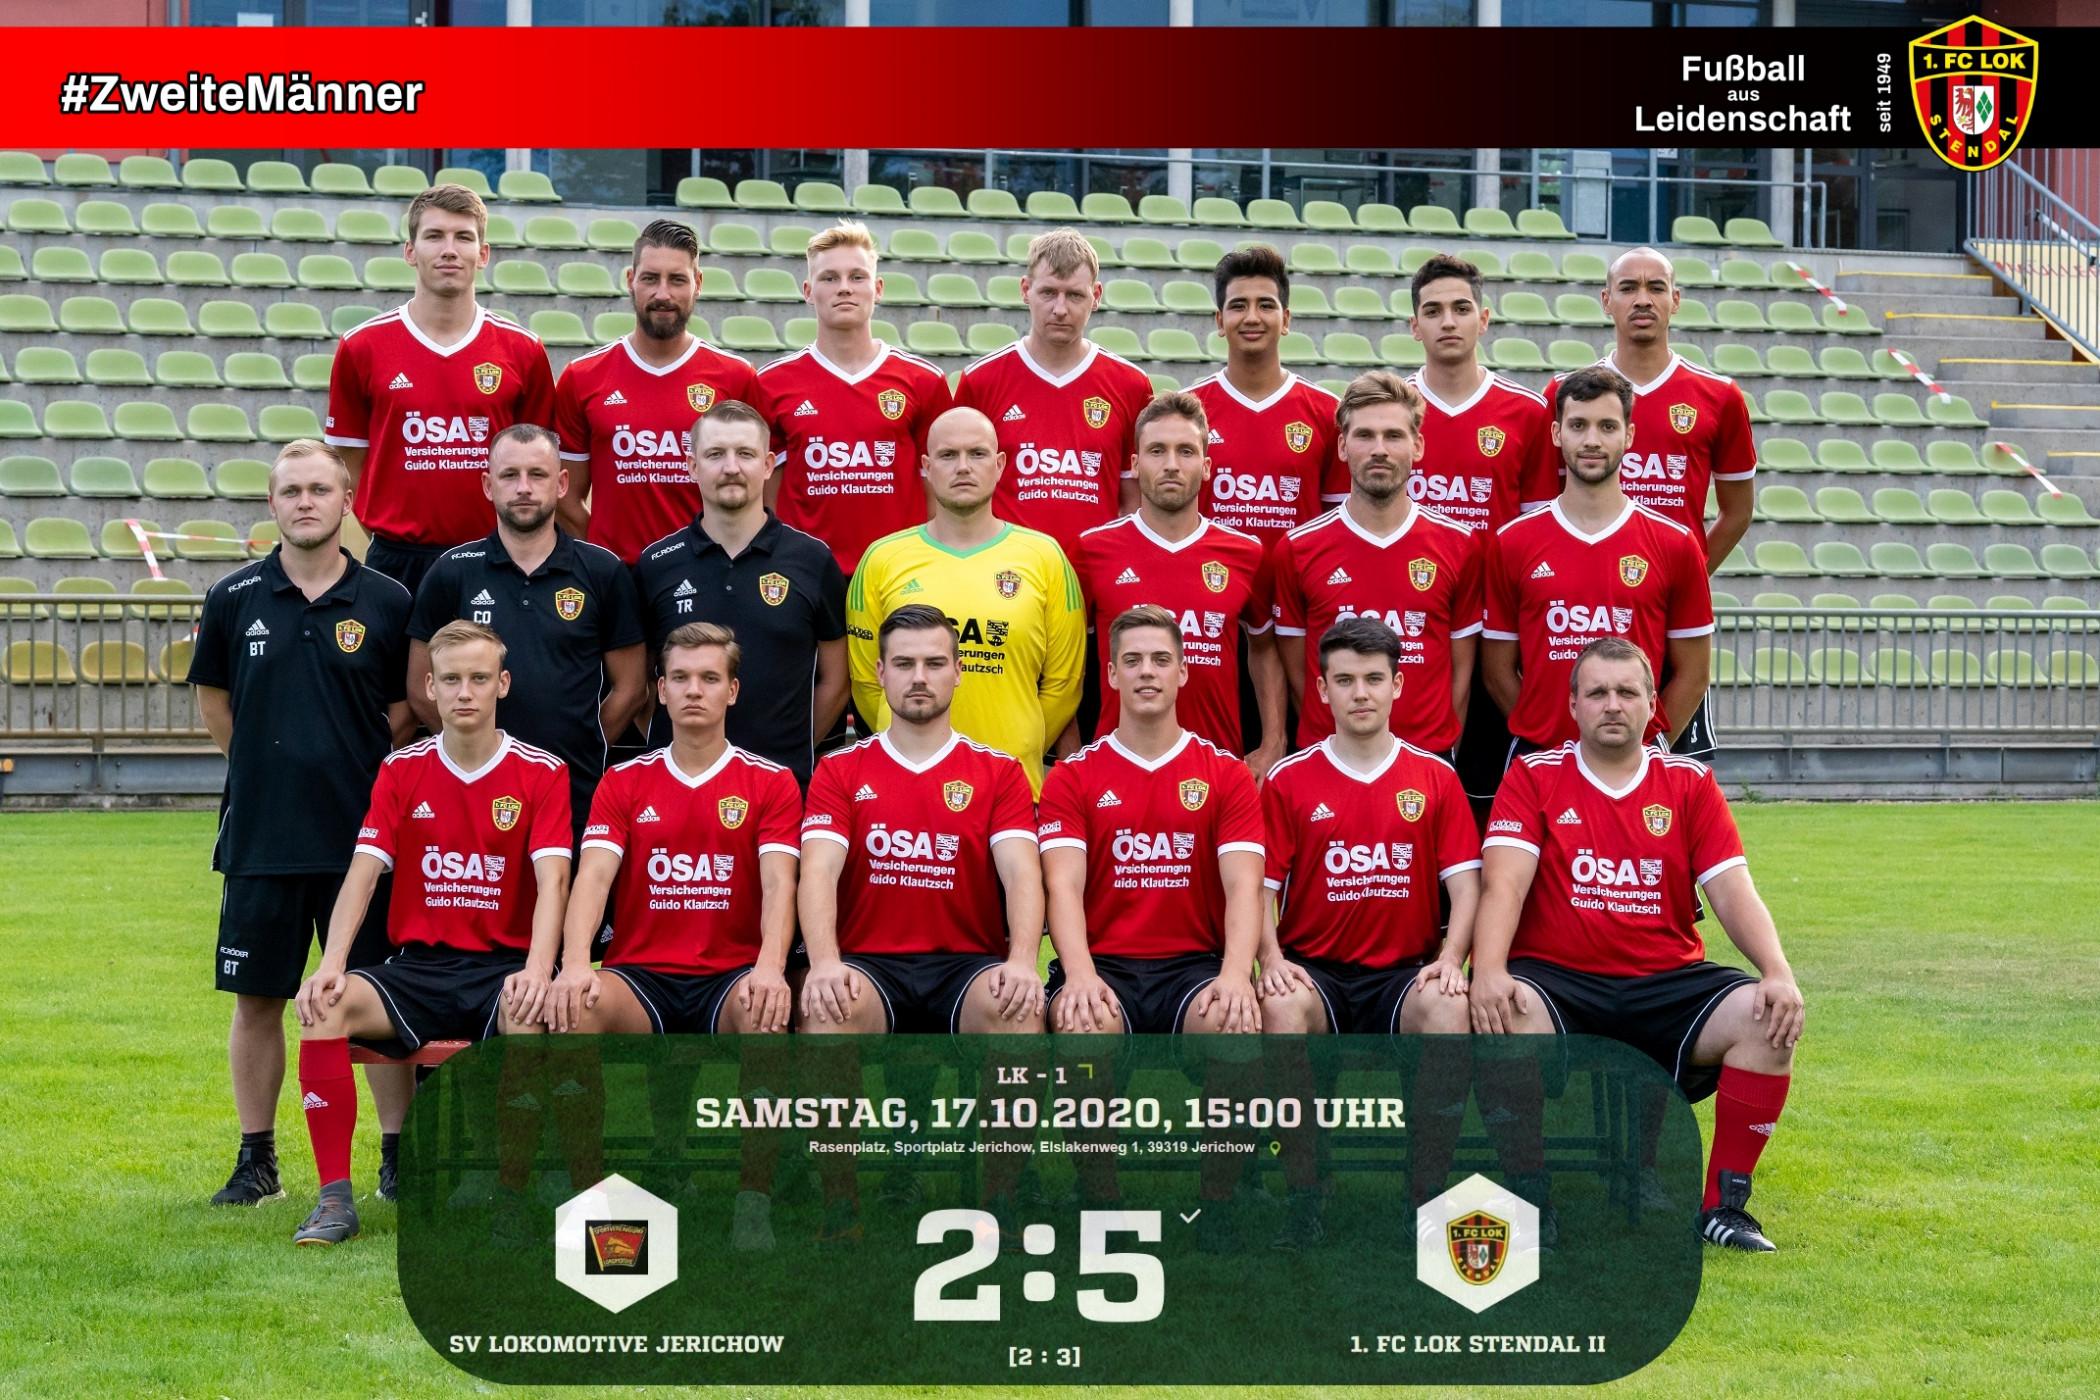 Landesklasse 1 ► 7. Spieltag - 1. FC Lok Stendal